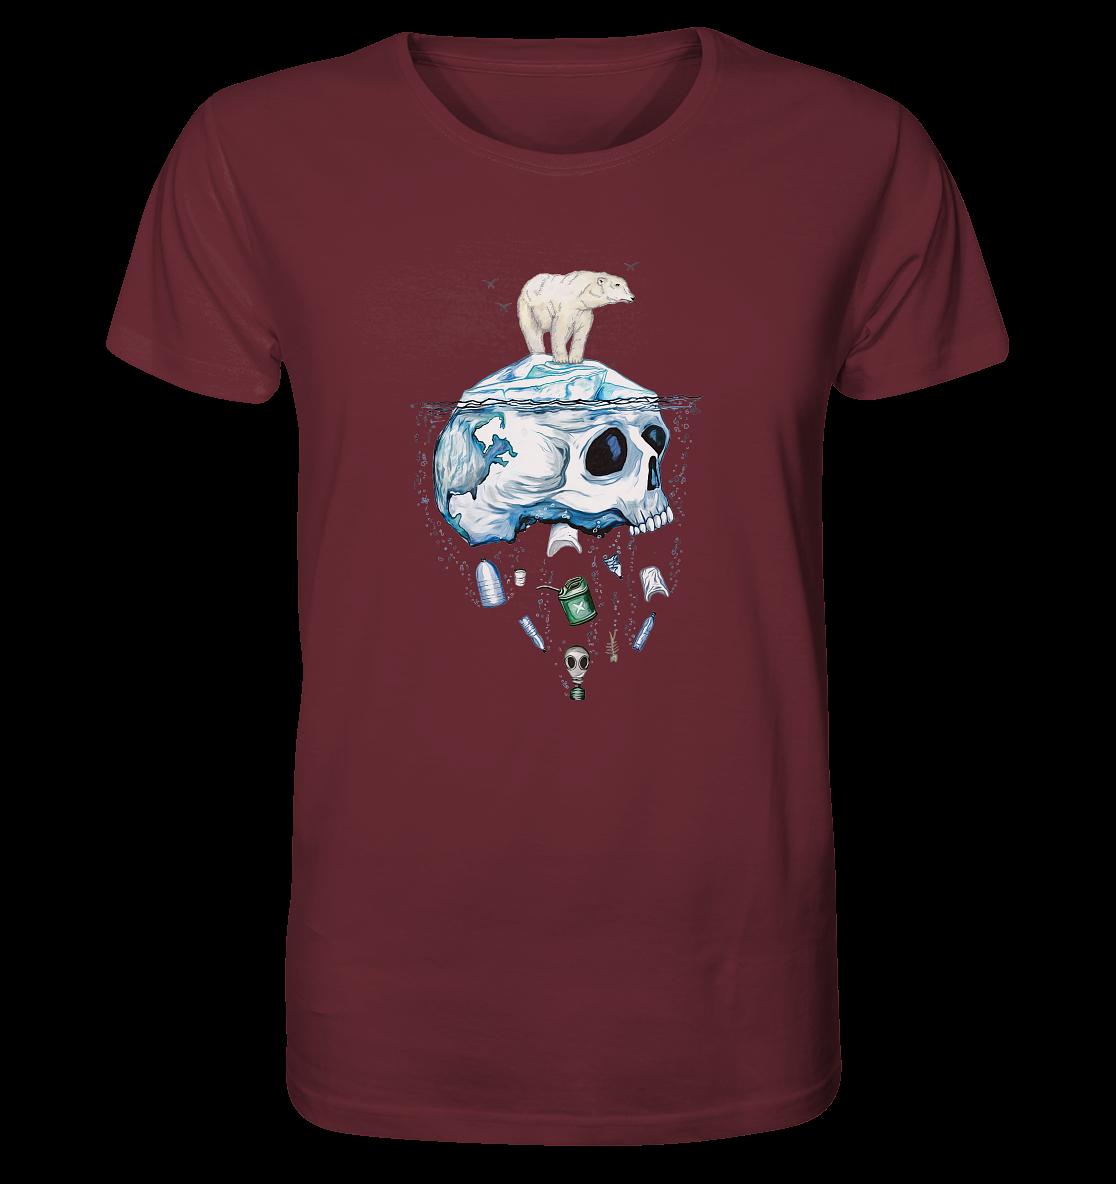 front-organic-shirt-672b34-1116x.png